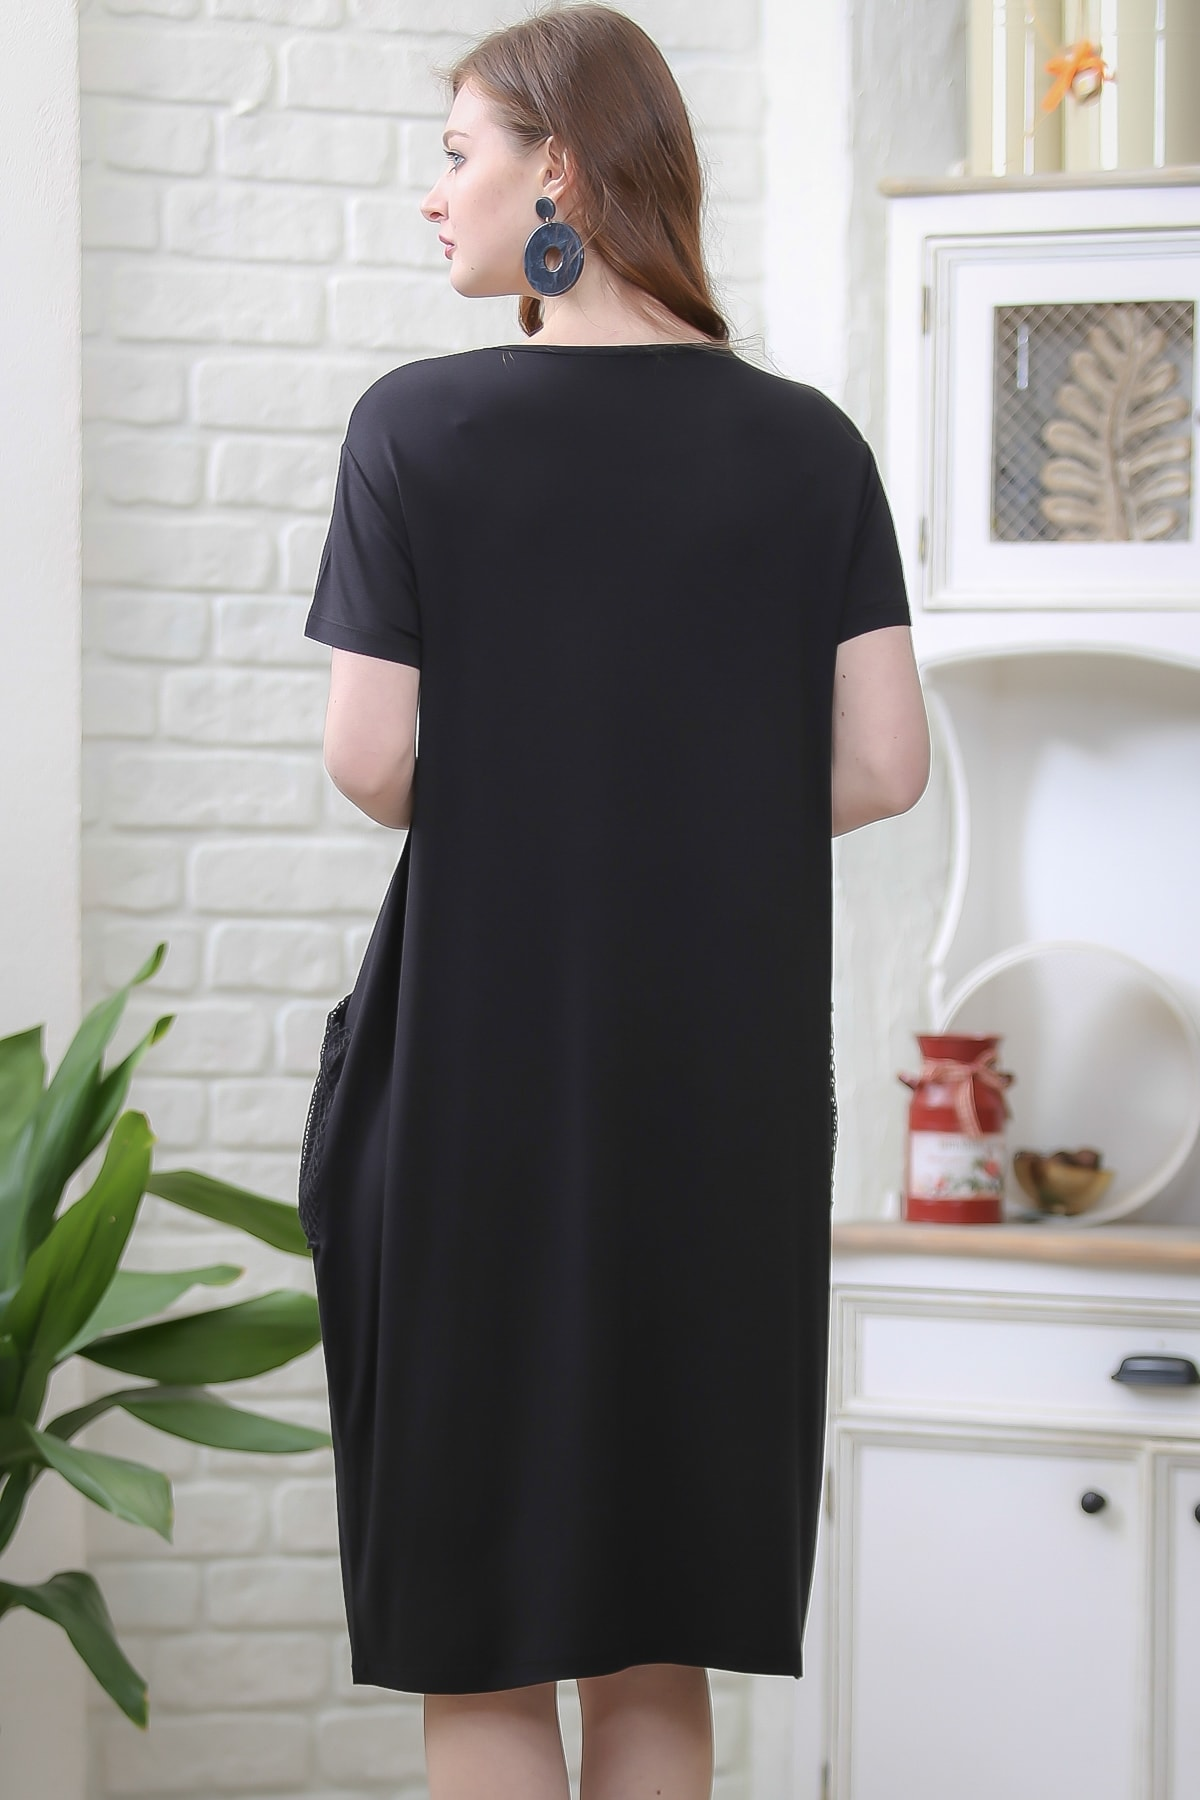 Chiccy Kadın Siyah Retro File Cep Detaylı Kısa Kollu Salaş Elbise M10160000EL97336 3